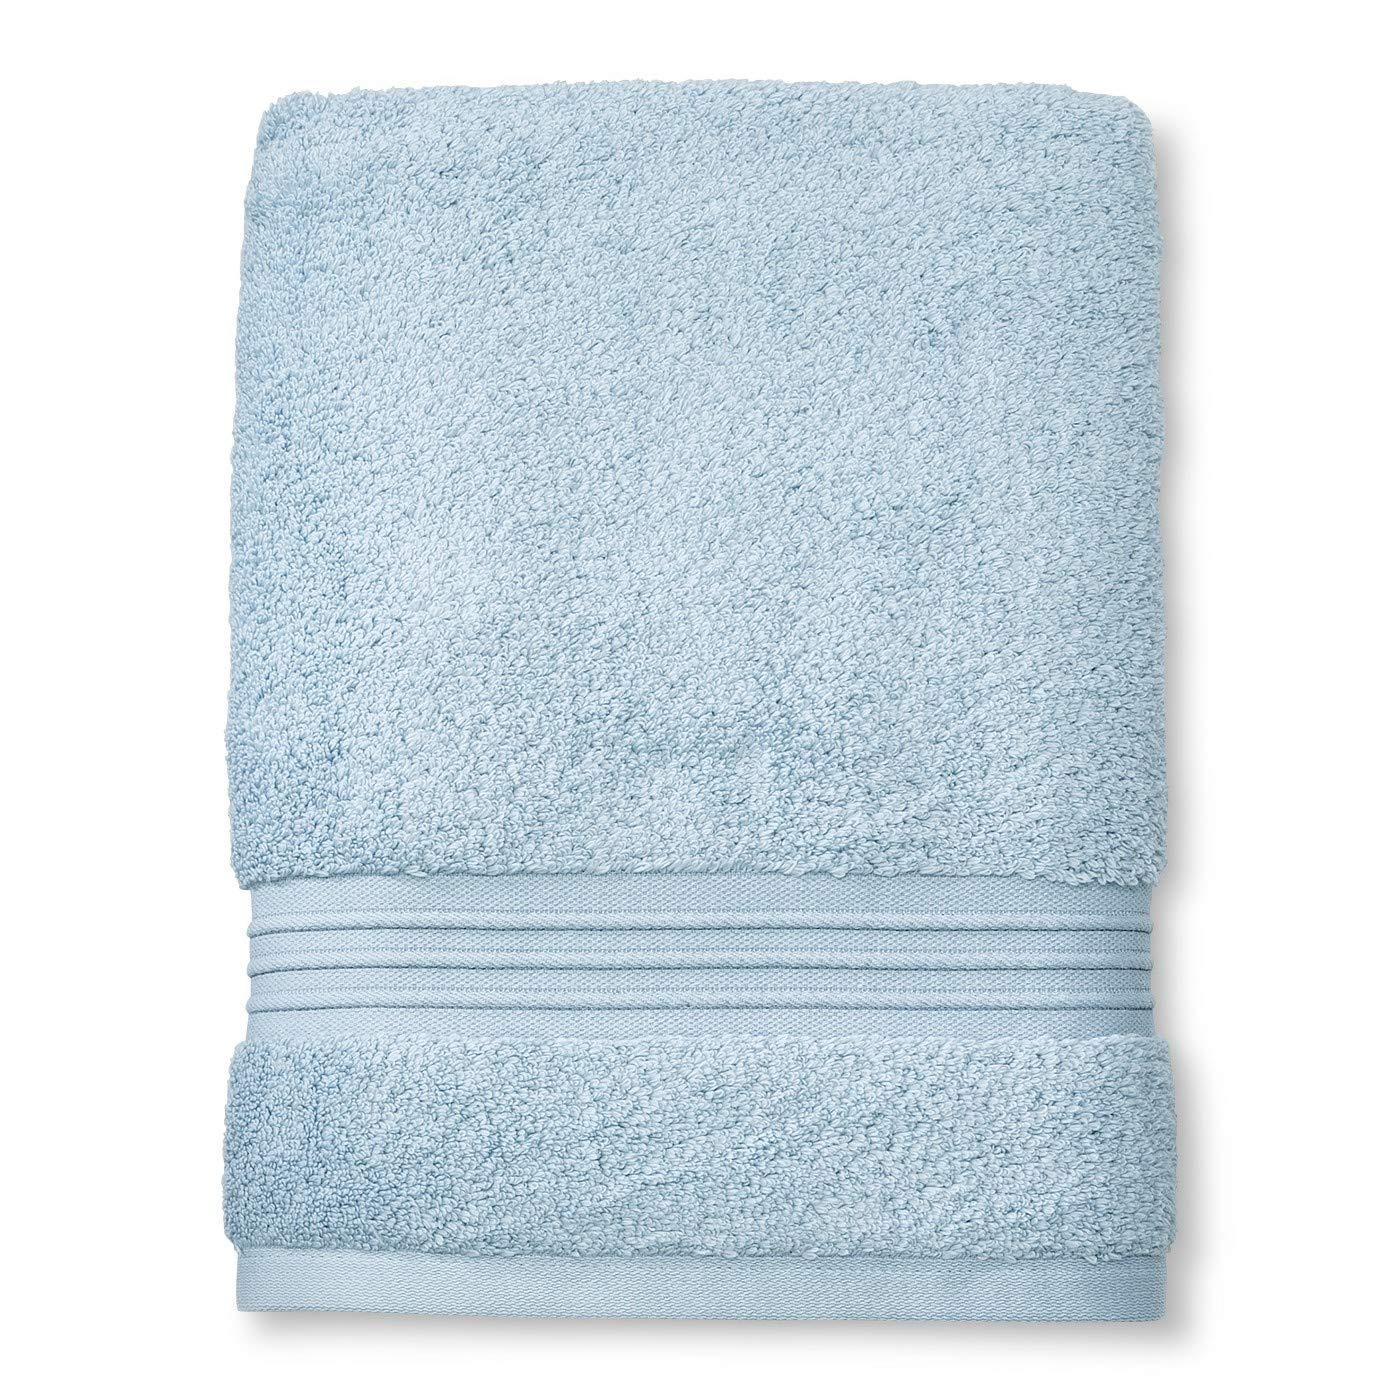 Fieldcrest Spa Collection Glowing Blue Bath Towel